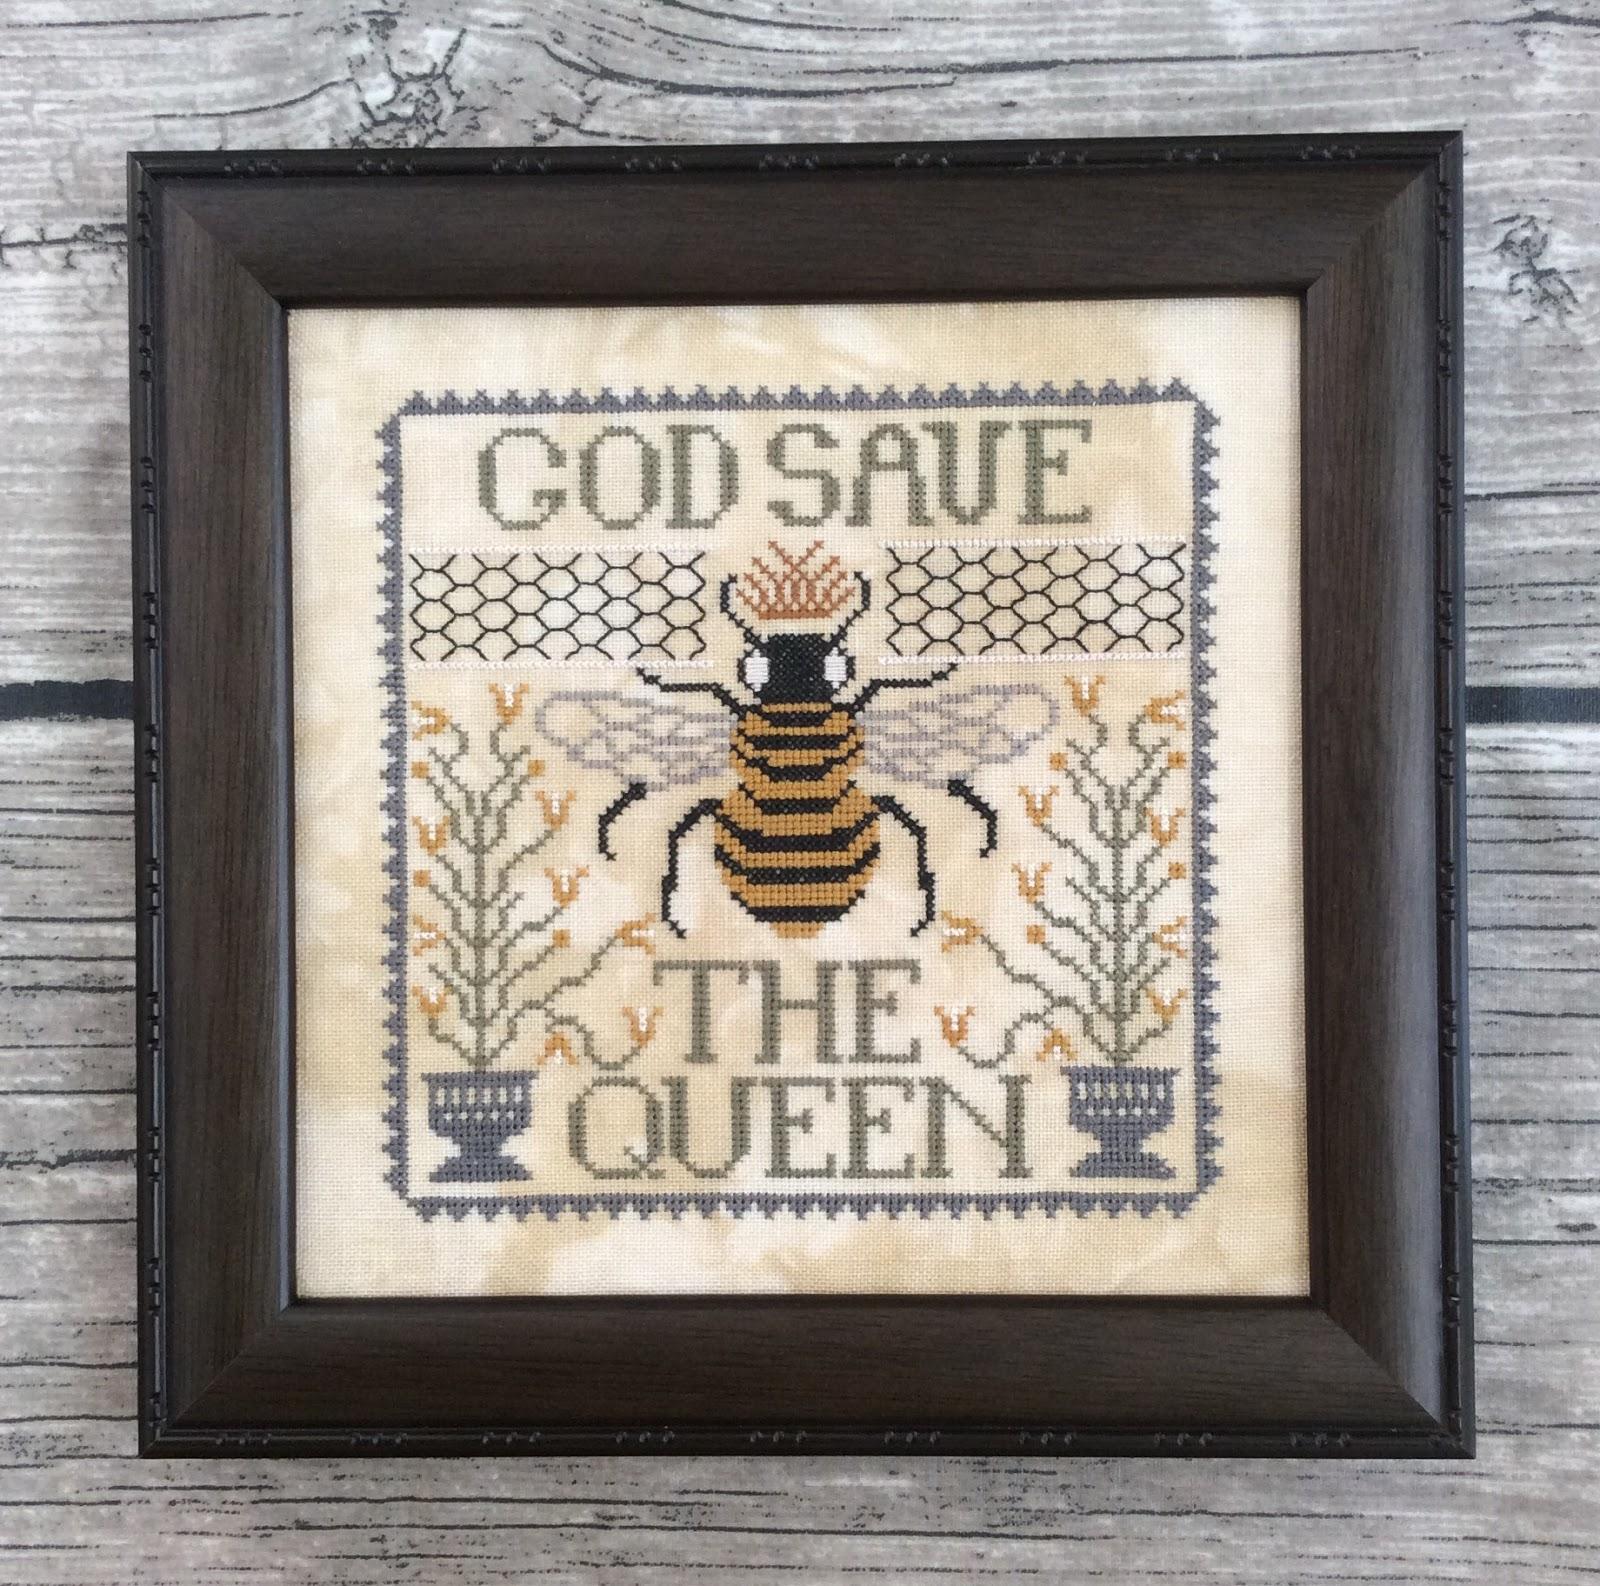 annie beez folk art god save the queen. Black Bedroom Furniture Sets. Home Design Ideas